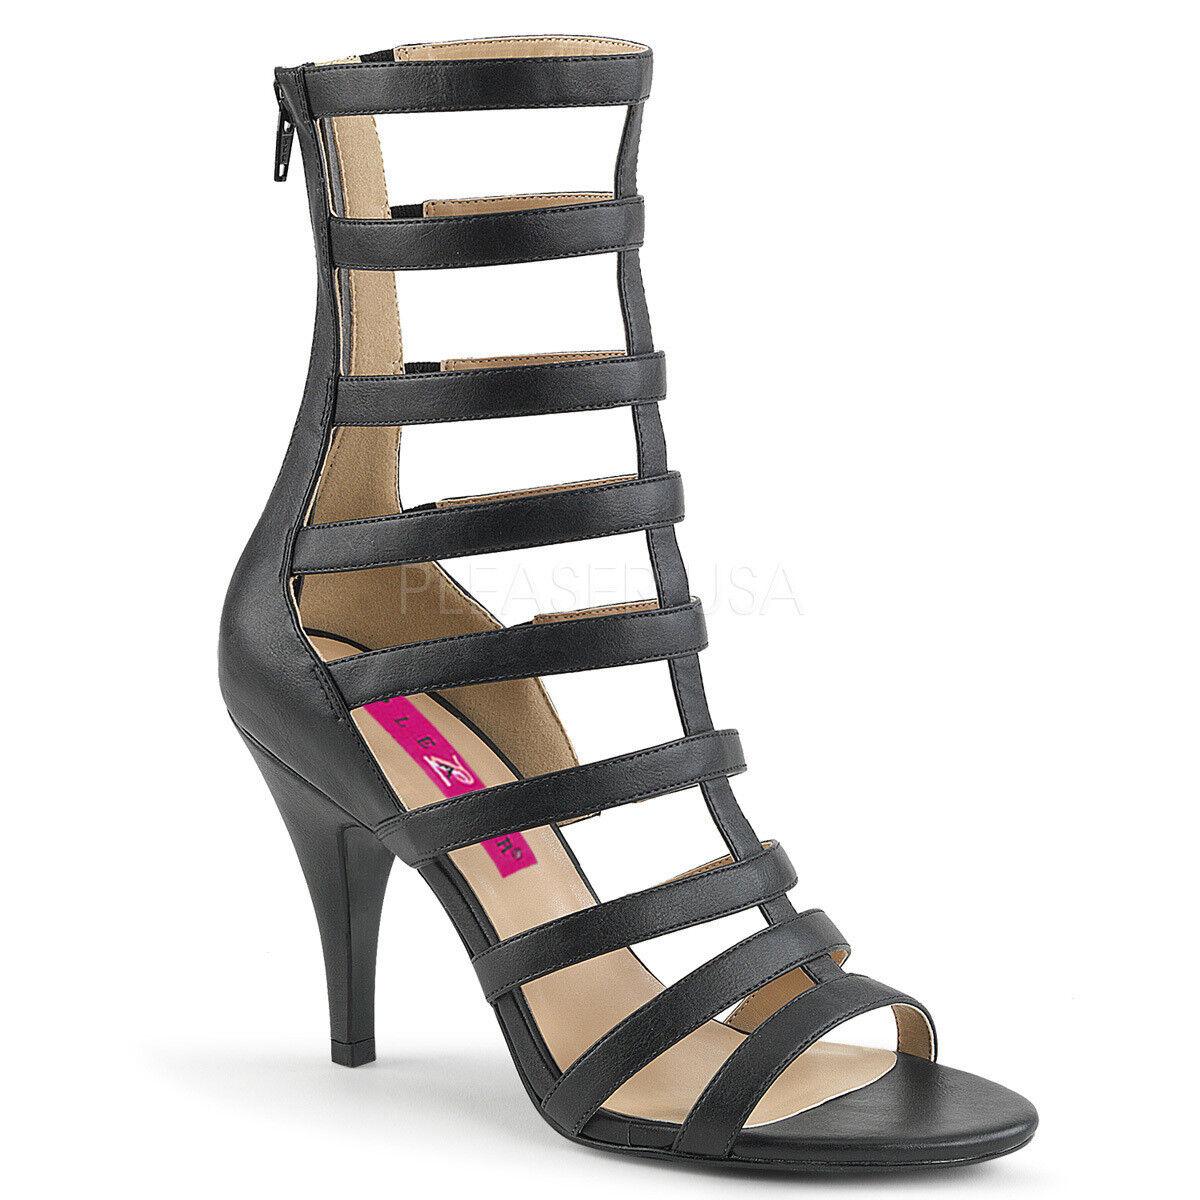 Rebajas Dream negro - 438 Pleaser High-heels con tiras sandalias negro Dream efecto piel talla 47 0244f5